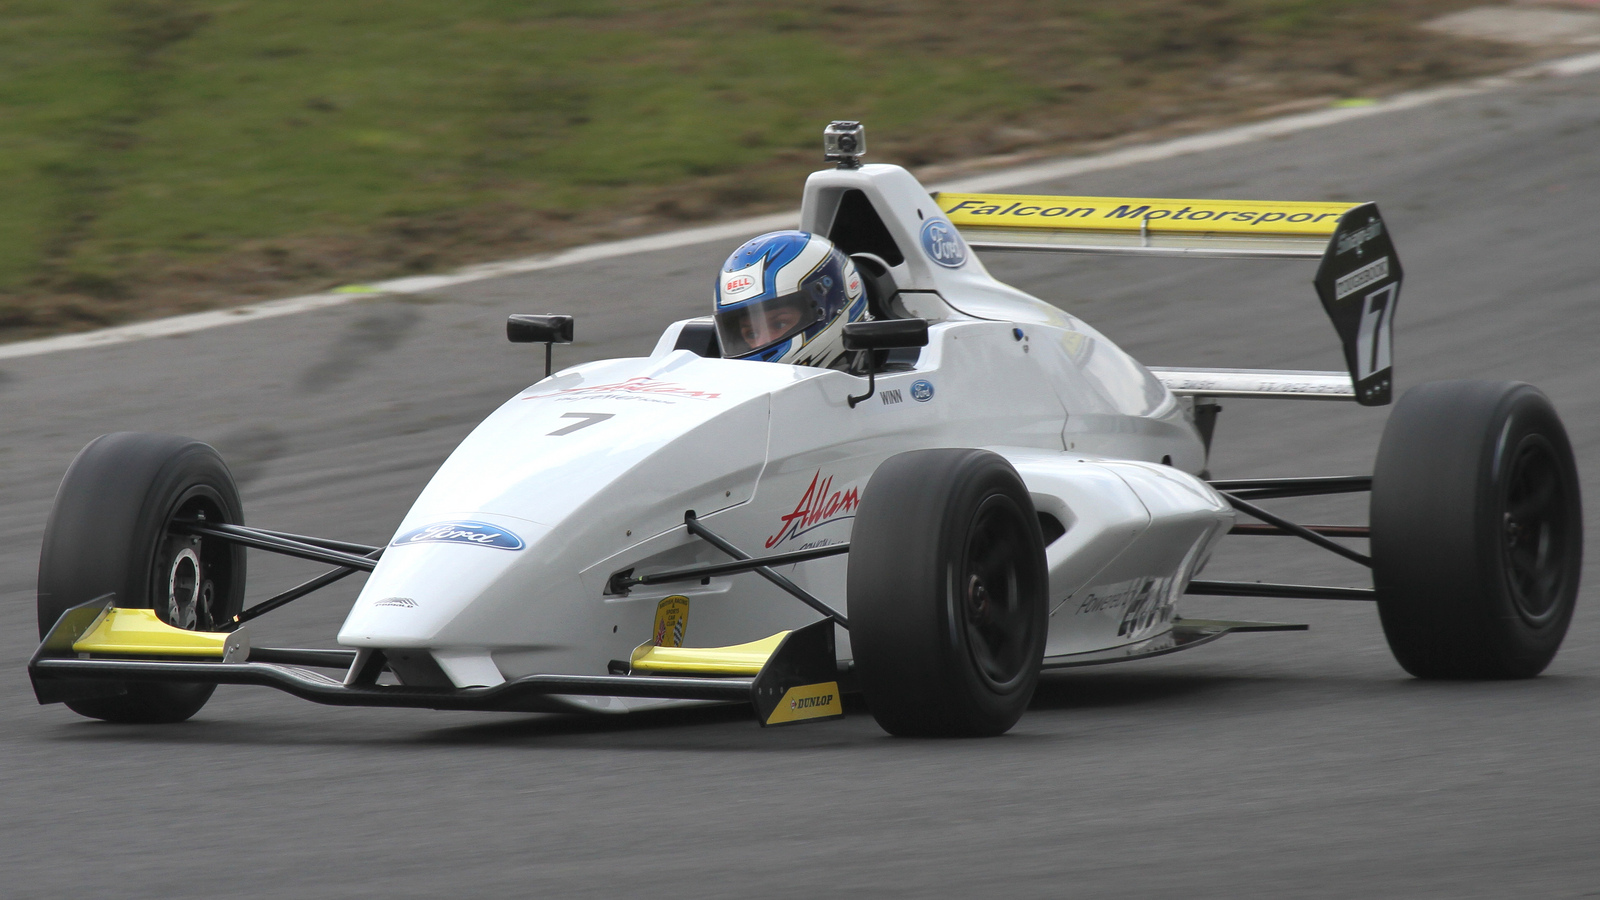 2013 Ford Formula Ford Ecoboost 200